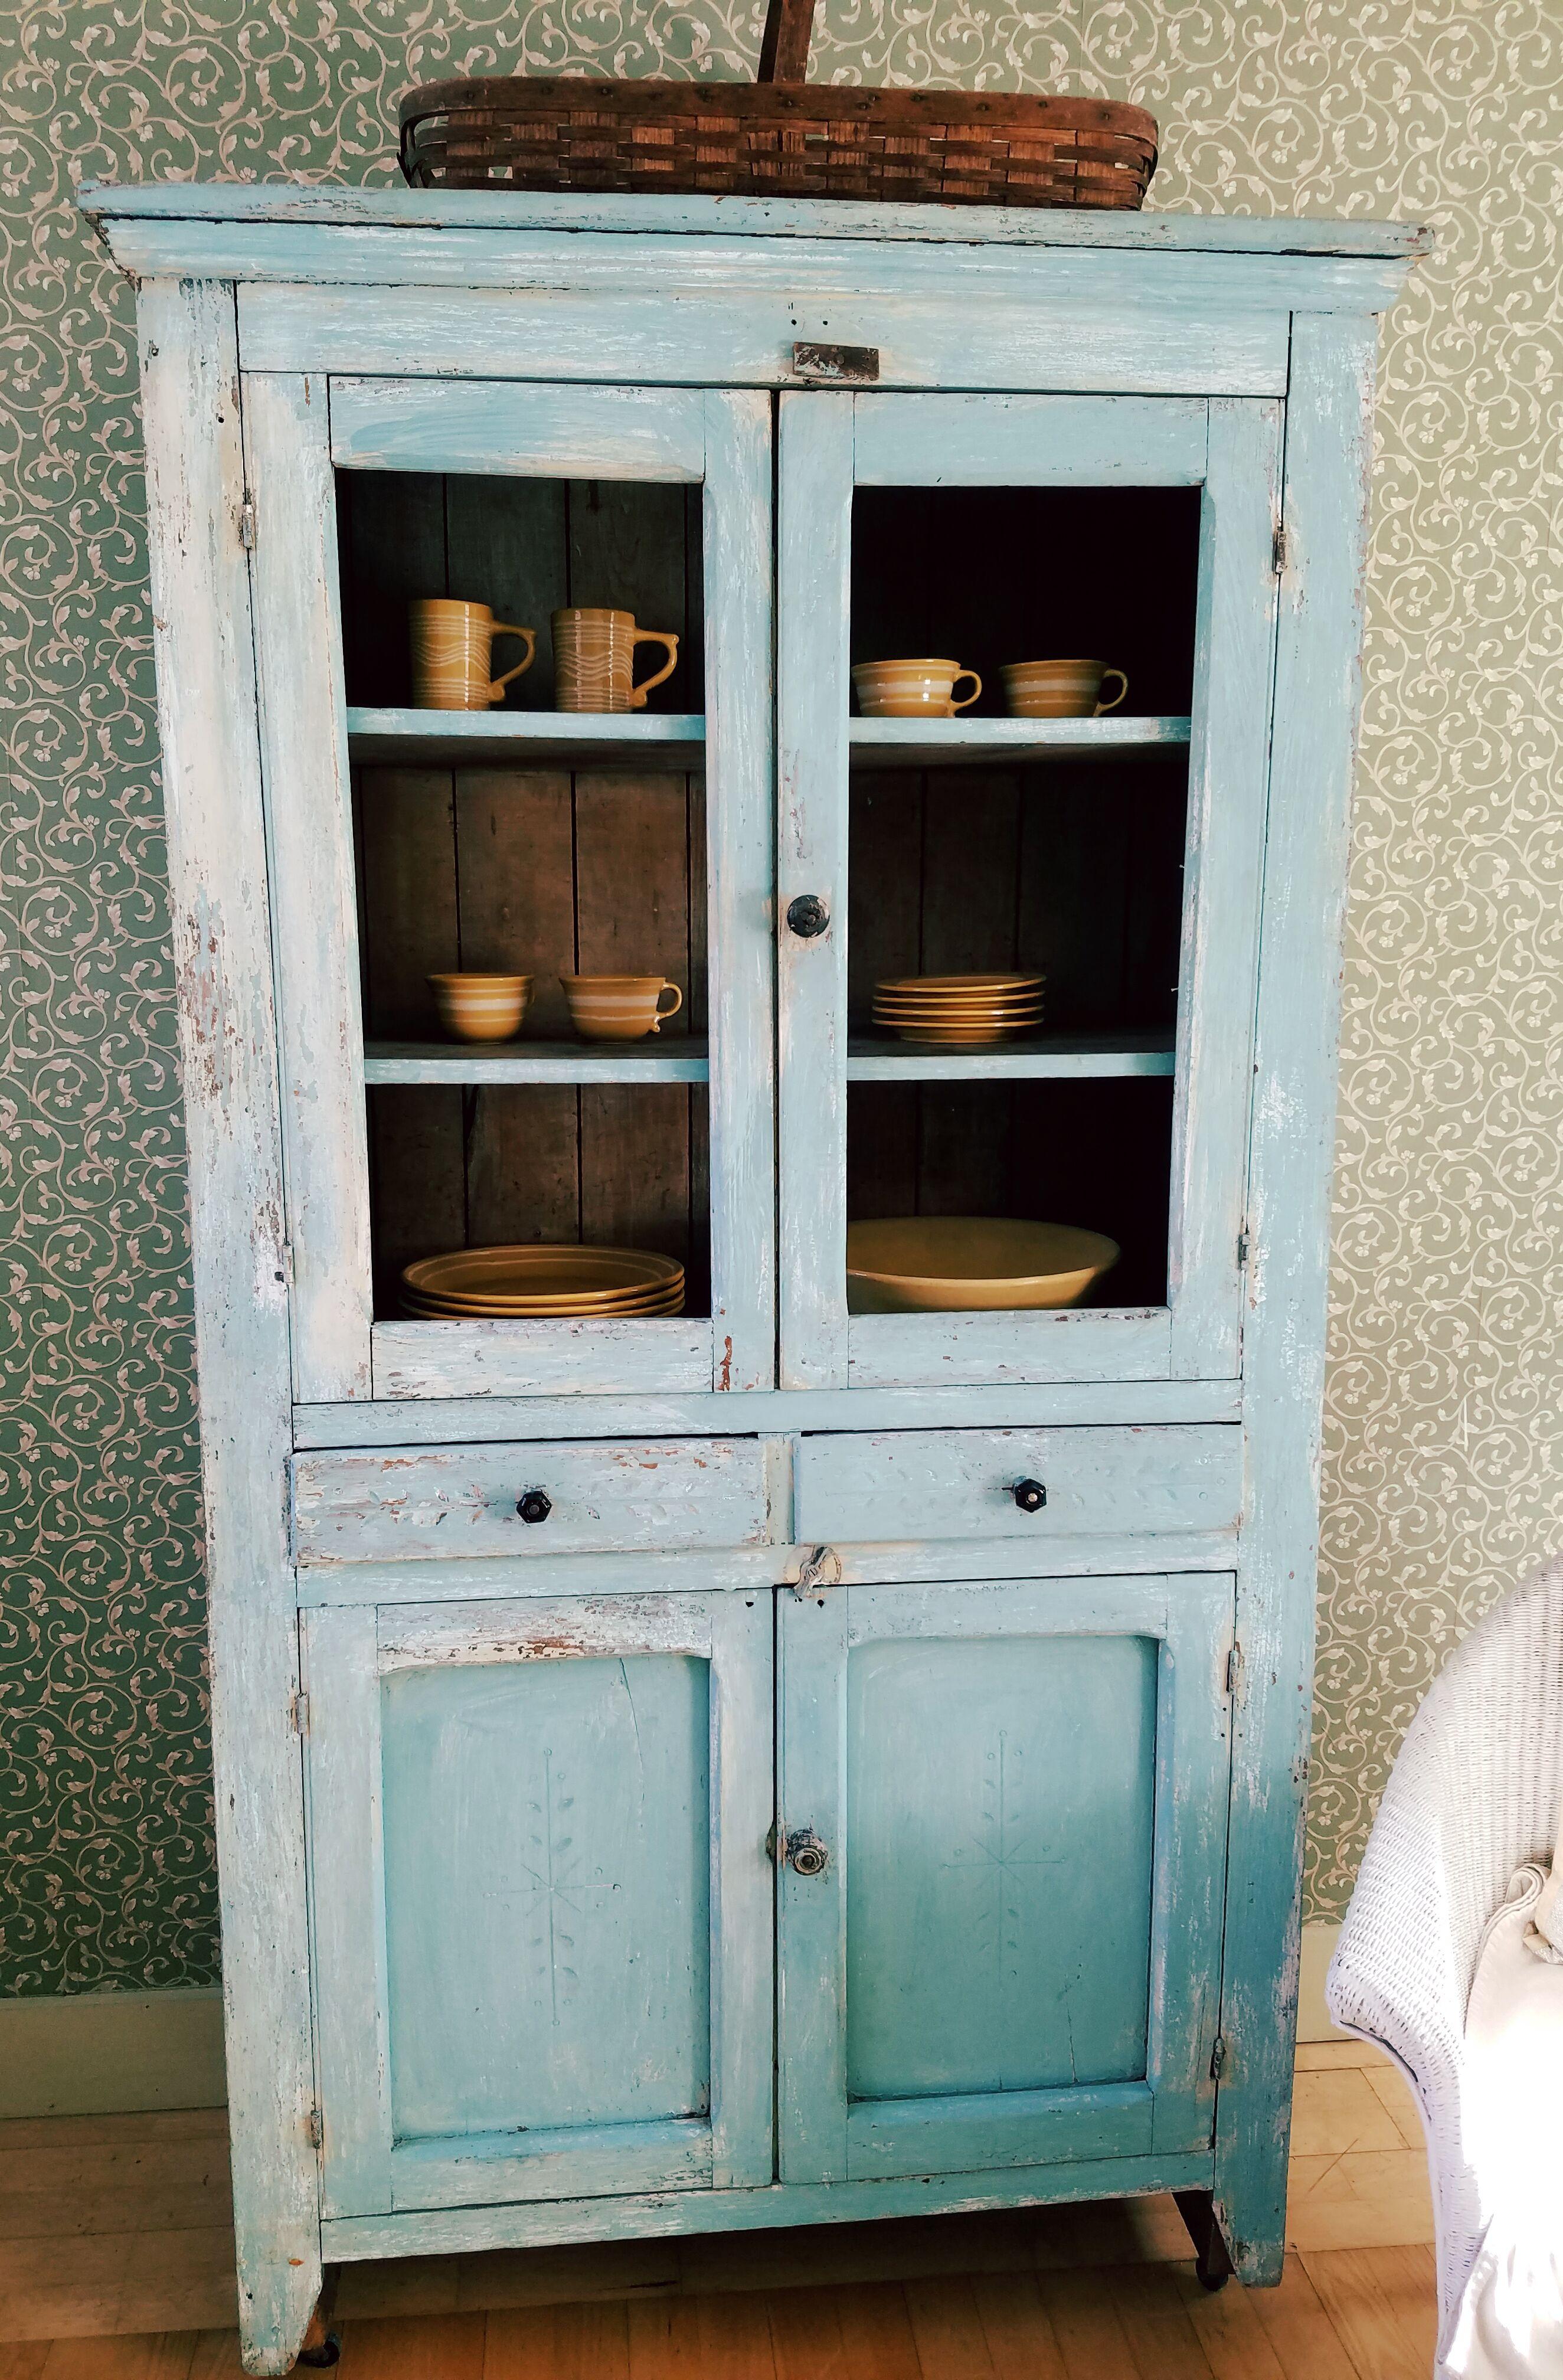 Olde painted cupboard entryway fifteen mile river primitives